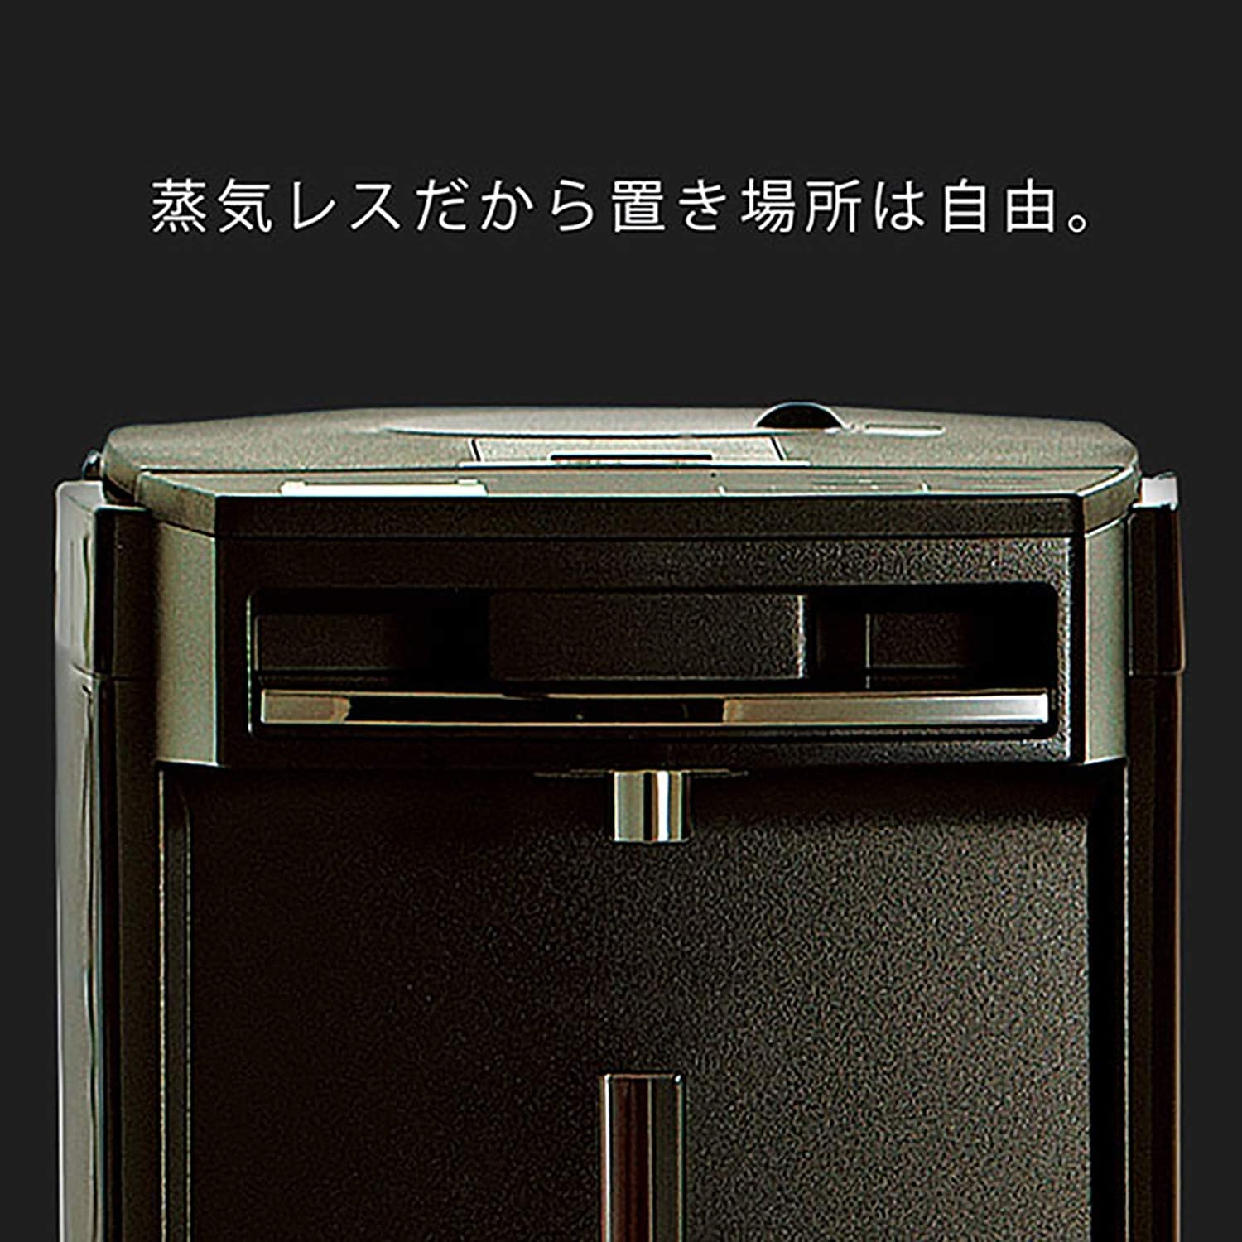 TIGER(タイガー)蒸気レスVE電気まほうびん PIM-A300の商品画像4